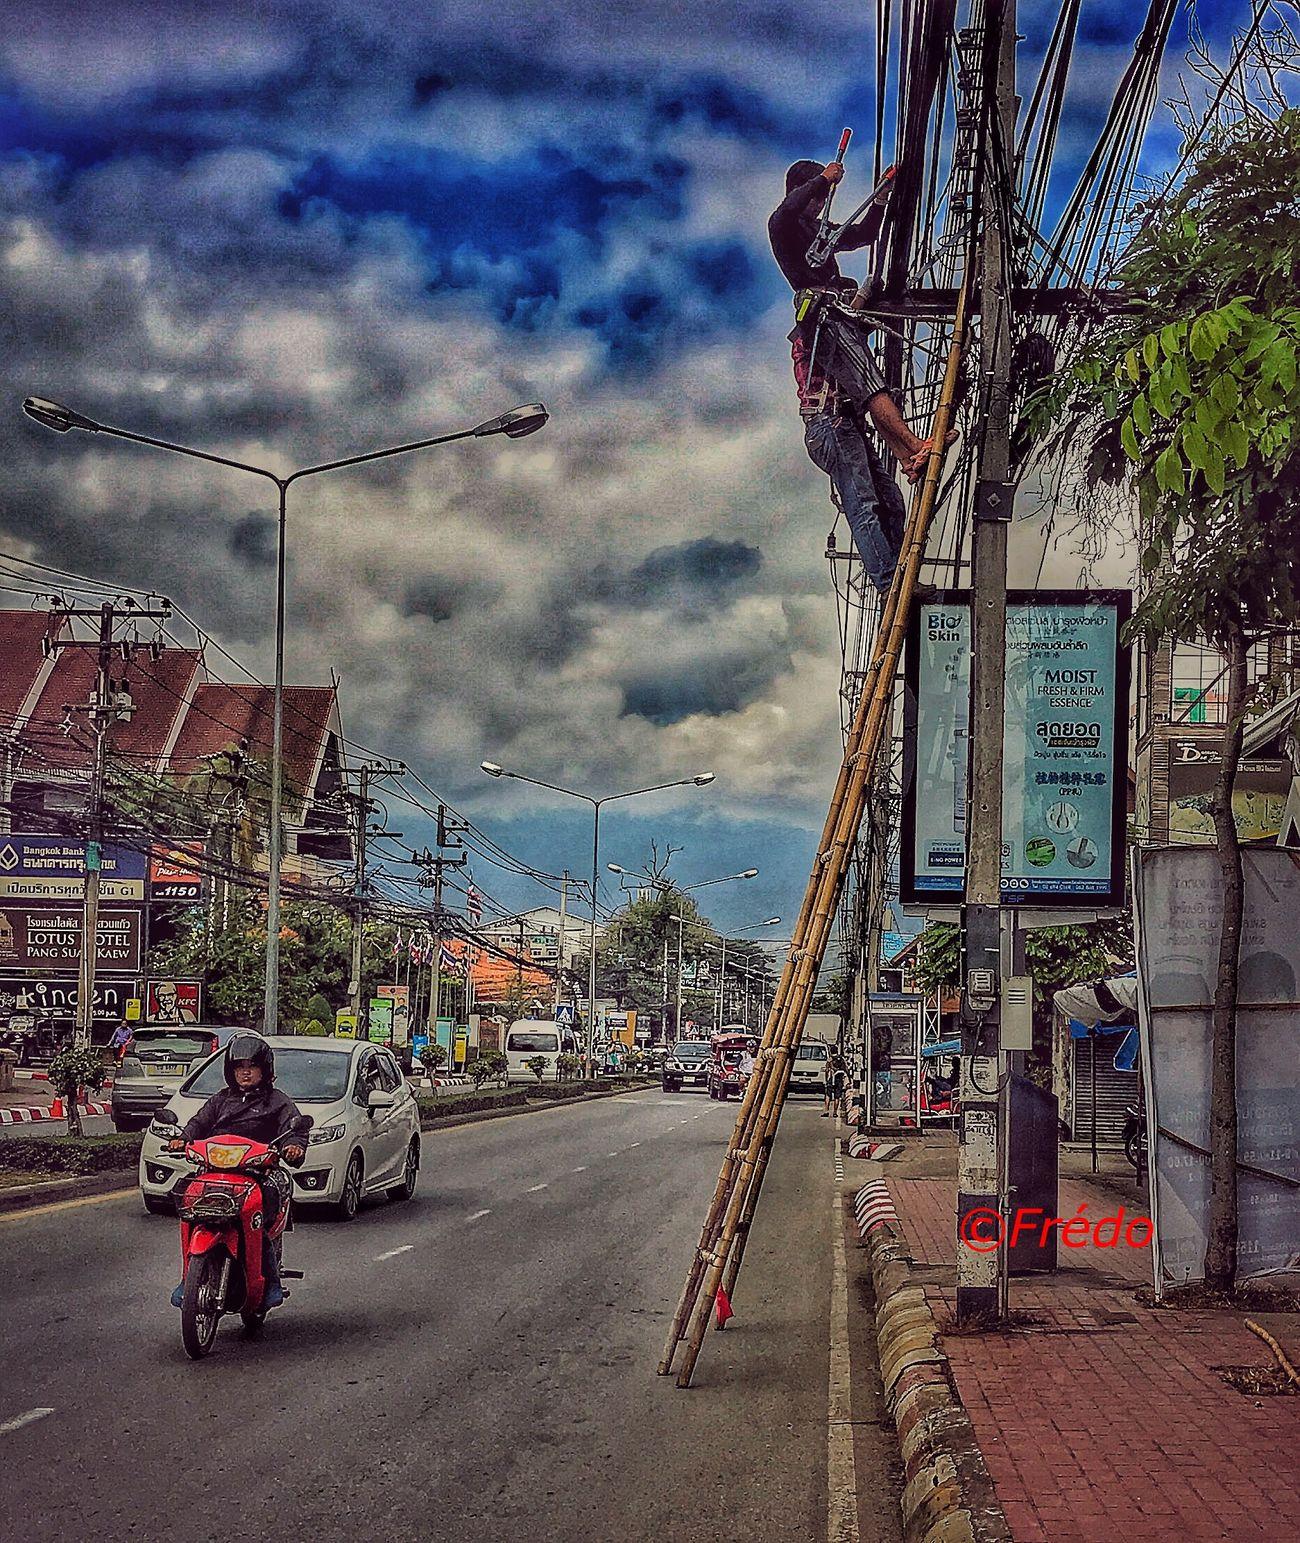 Wooden feet Streetphotography Thaïlande Real People EyeEm Best Shots Eyem Gallery Street Photos😄📷🏫⛪🚒🚐🚲⚠ EyeEm Best Edits Thailand Photos Thailand_allshots Streetphoto_color Thaistagram Eyem Best Shots Eye4photography Colorful Photo EyeEm Gallery EyeEmBestPics Street Photography Streetphoto